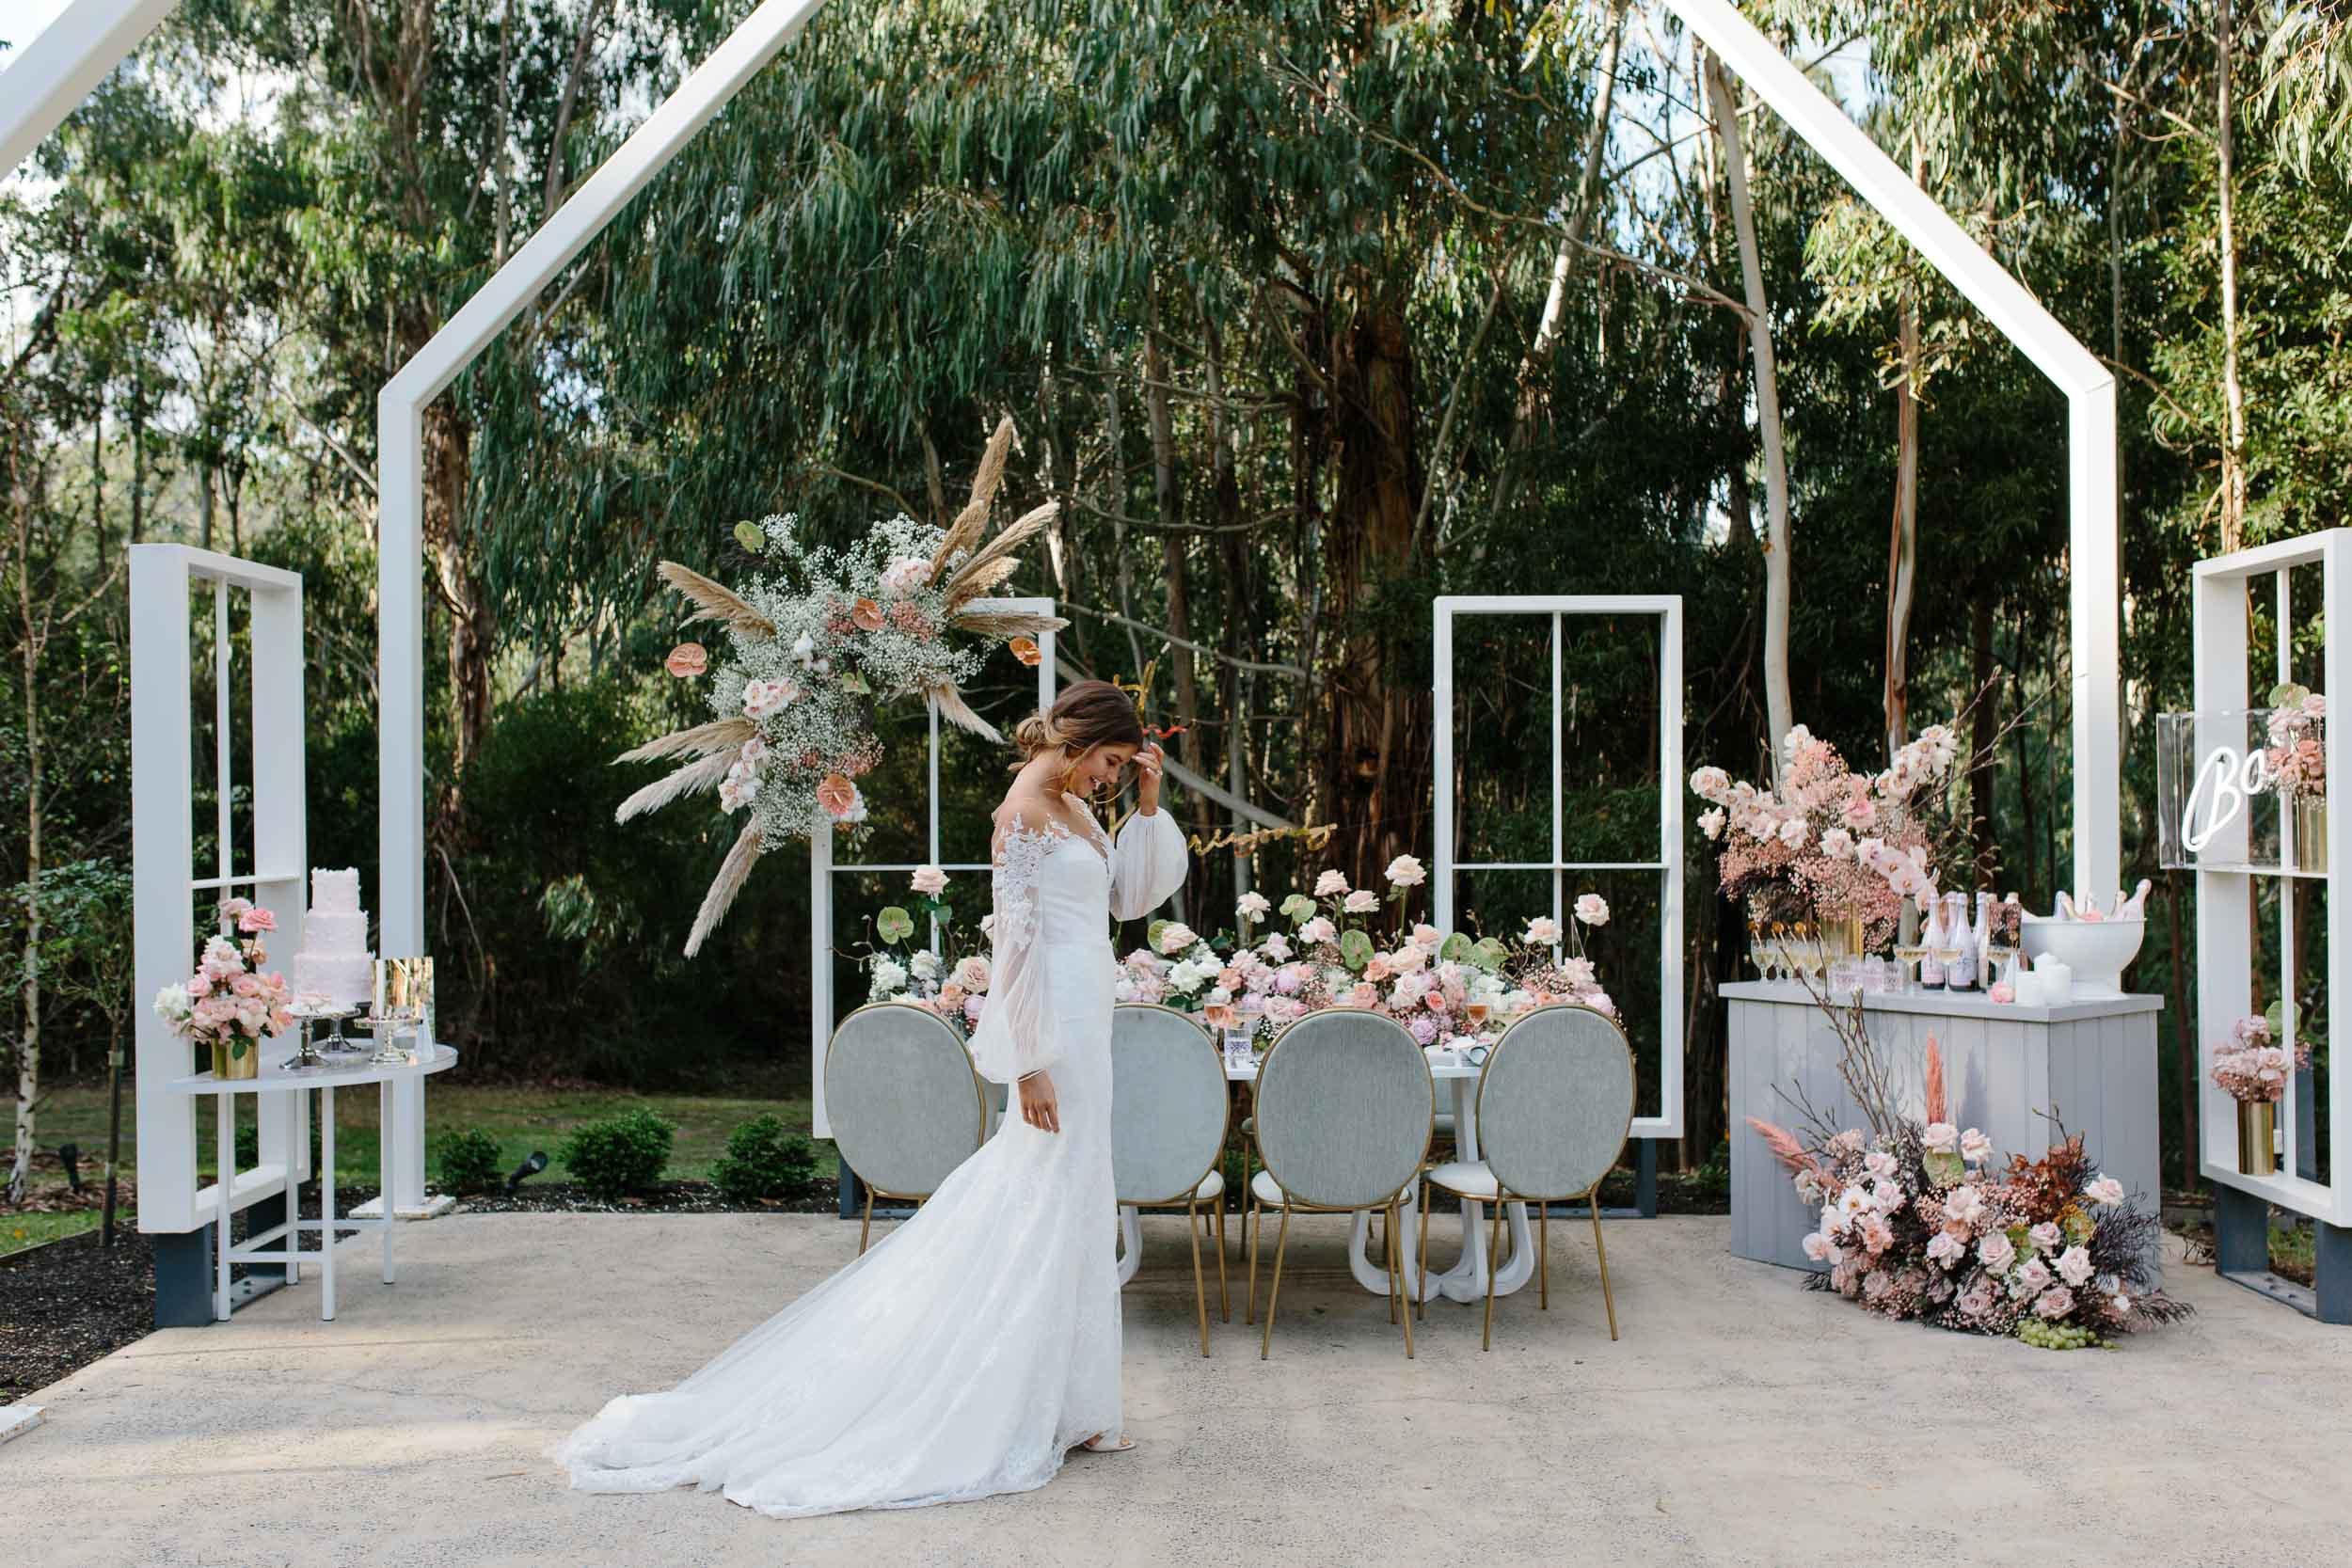 Kas-Richards-LENZO-Yarra-Valley-Wedding-One-Day-Bridal-193.jpg